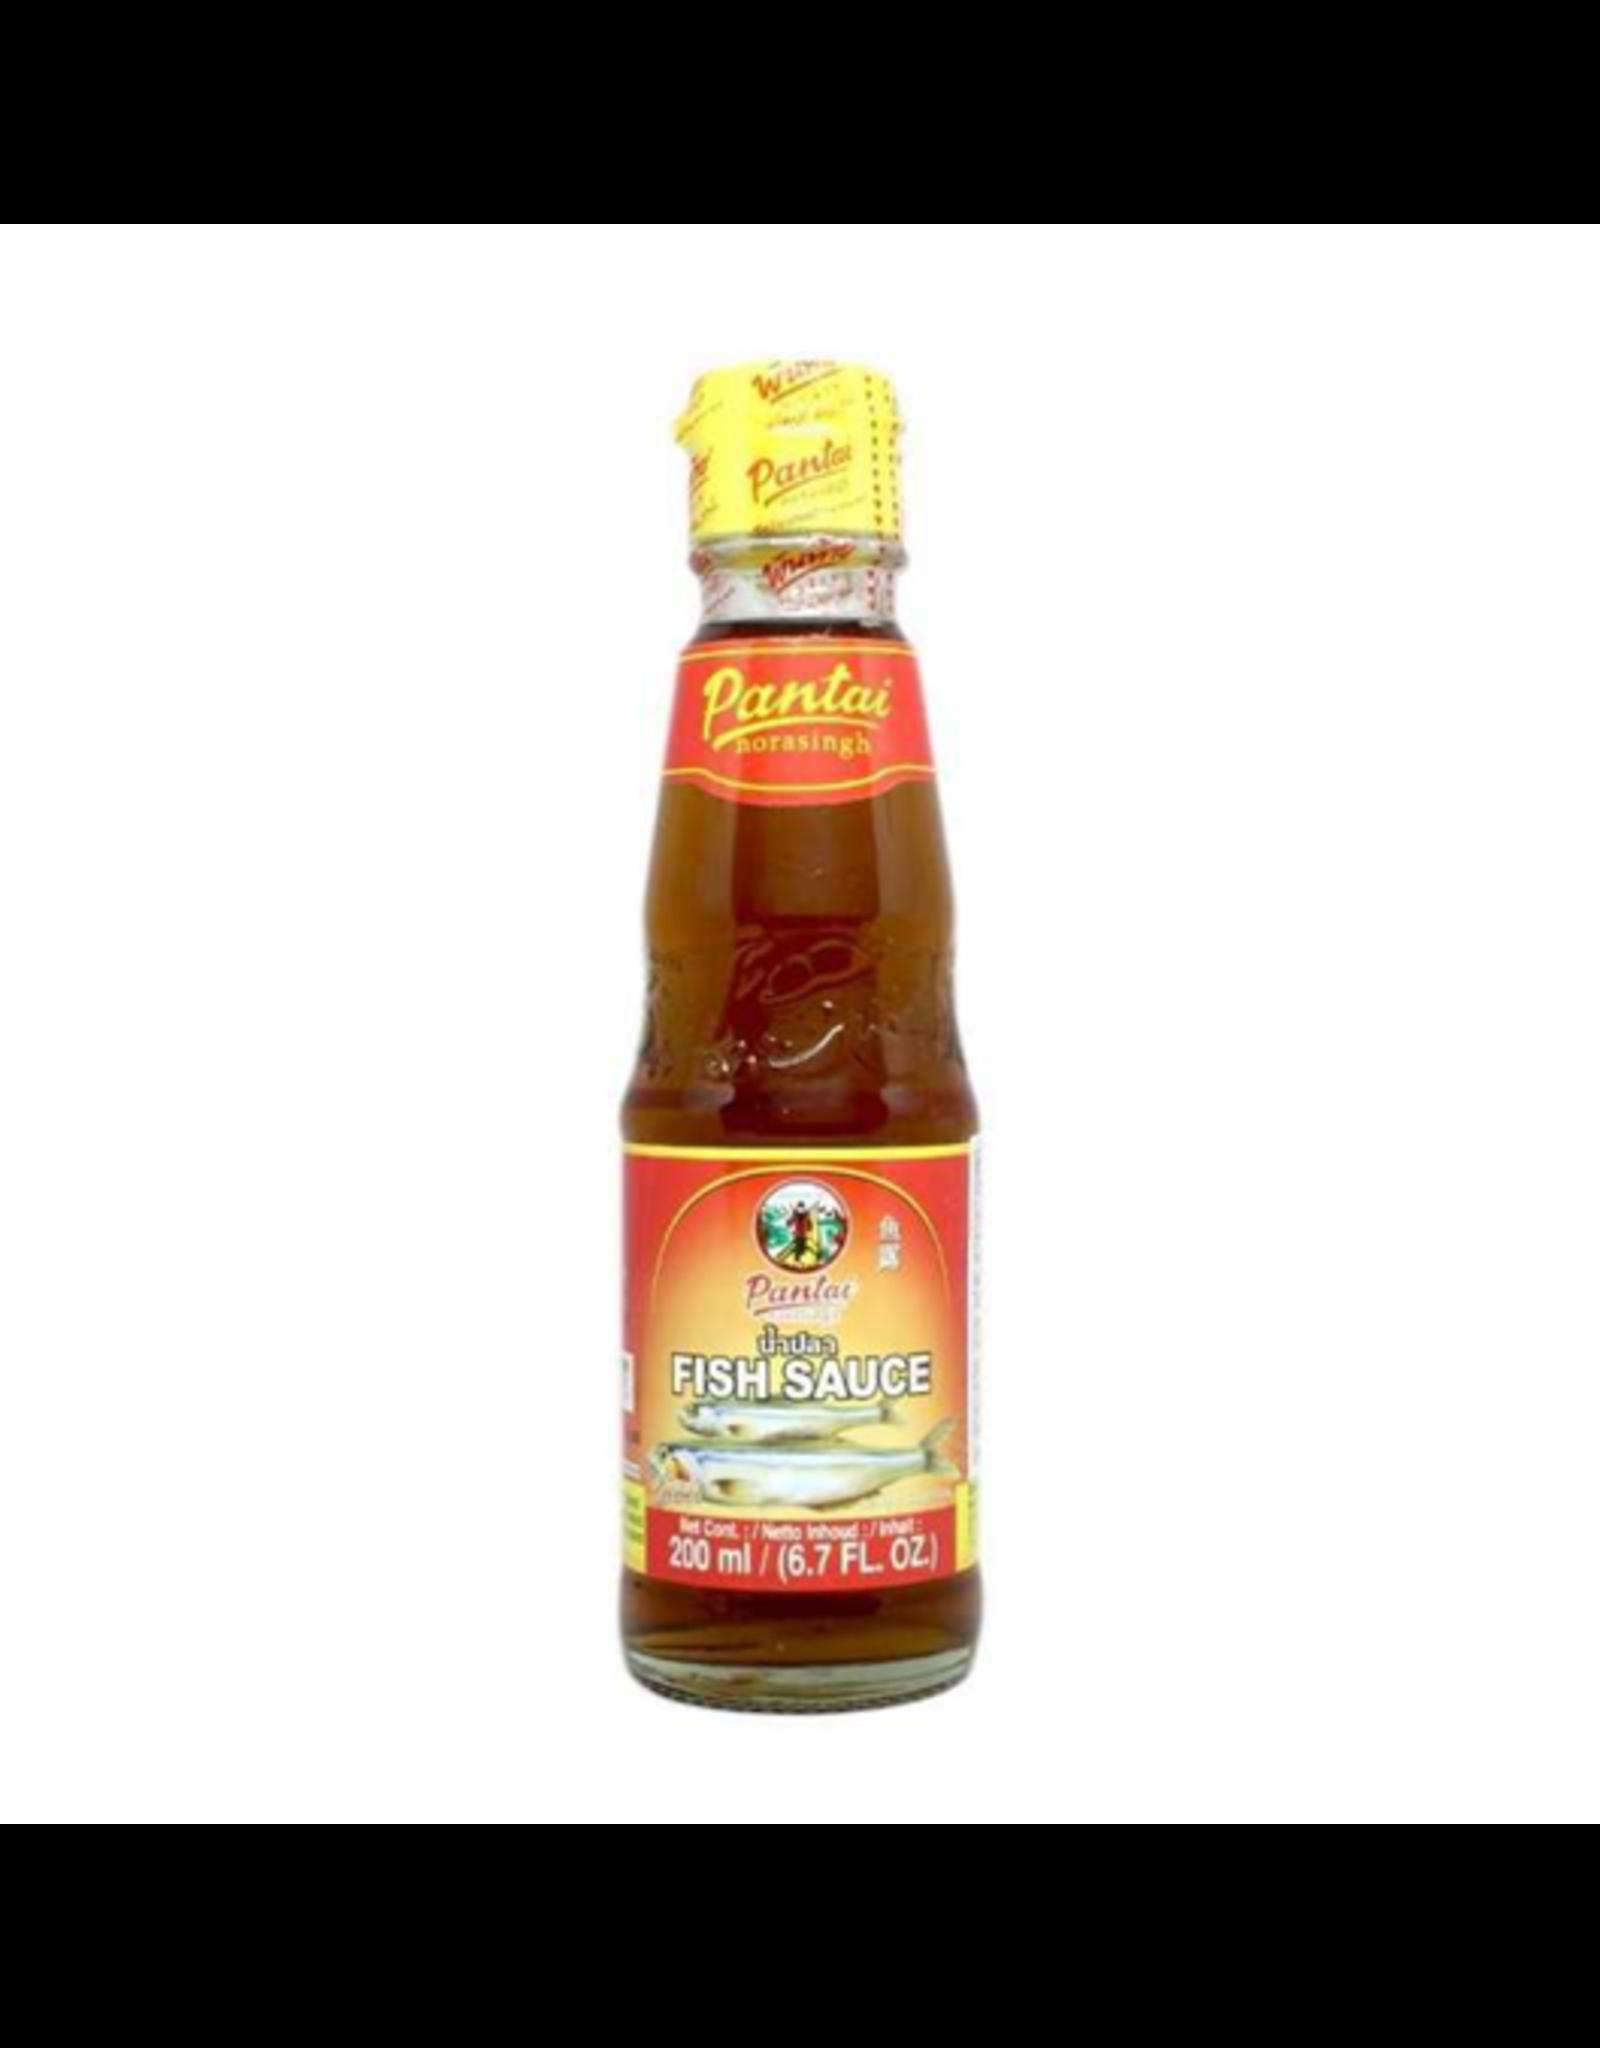 Pantai Norasingh Fish sauce